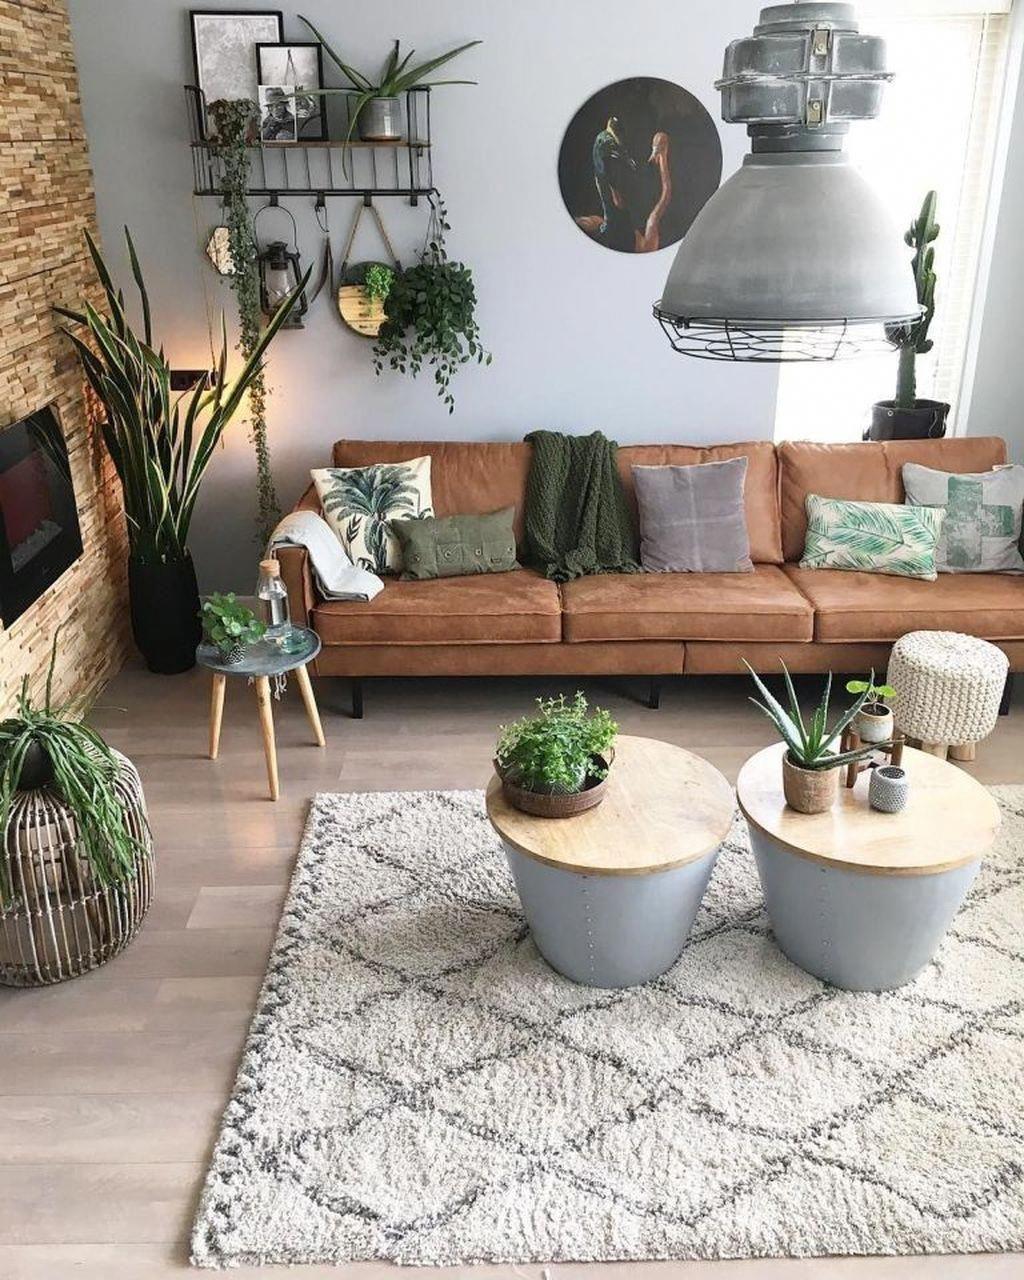 Pinterest Home Decor Ideas For Christmas Homedecorideas Industrial Style Living Room Minimalist Living Room Brown Living Room